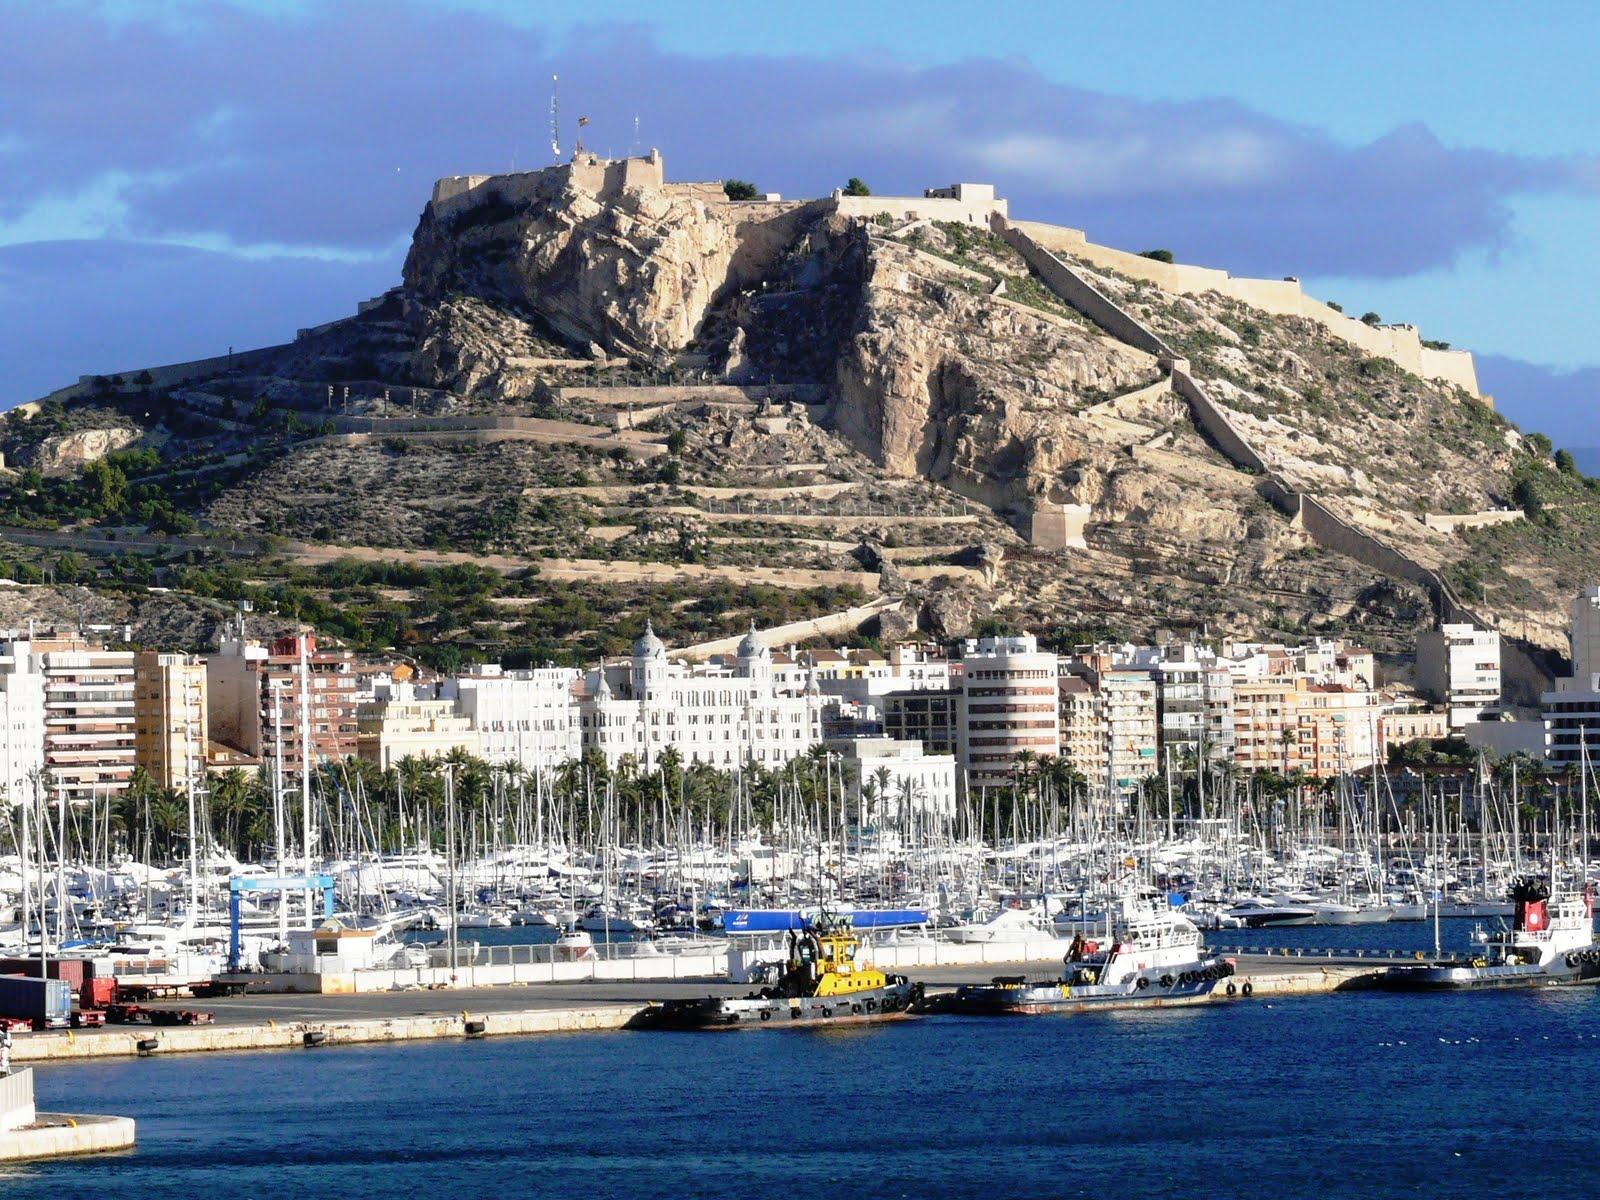 Alicante Spain  city pictures gallery : Water Under the Bridges: November 22 Alicante, Spain